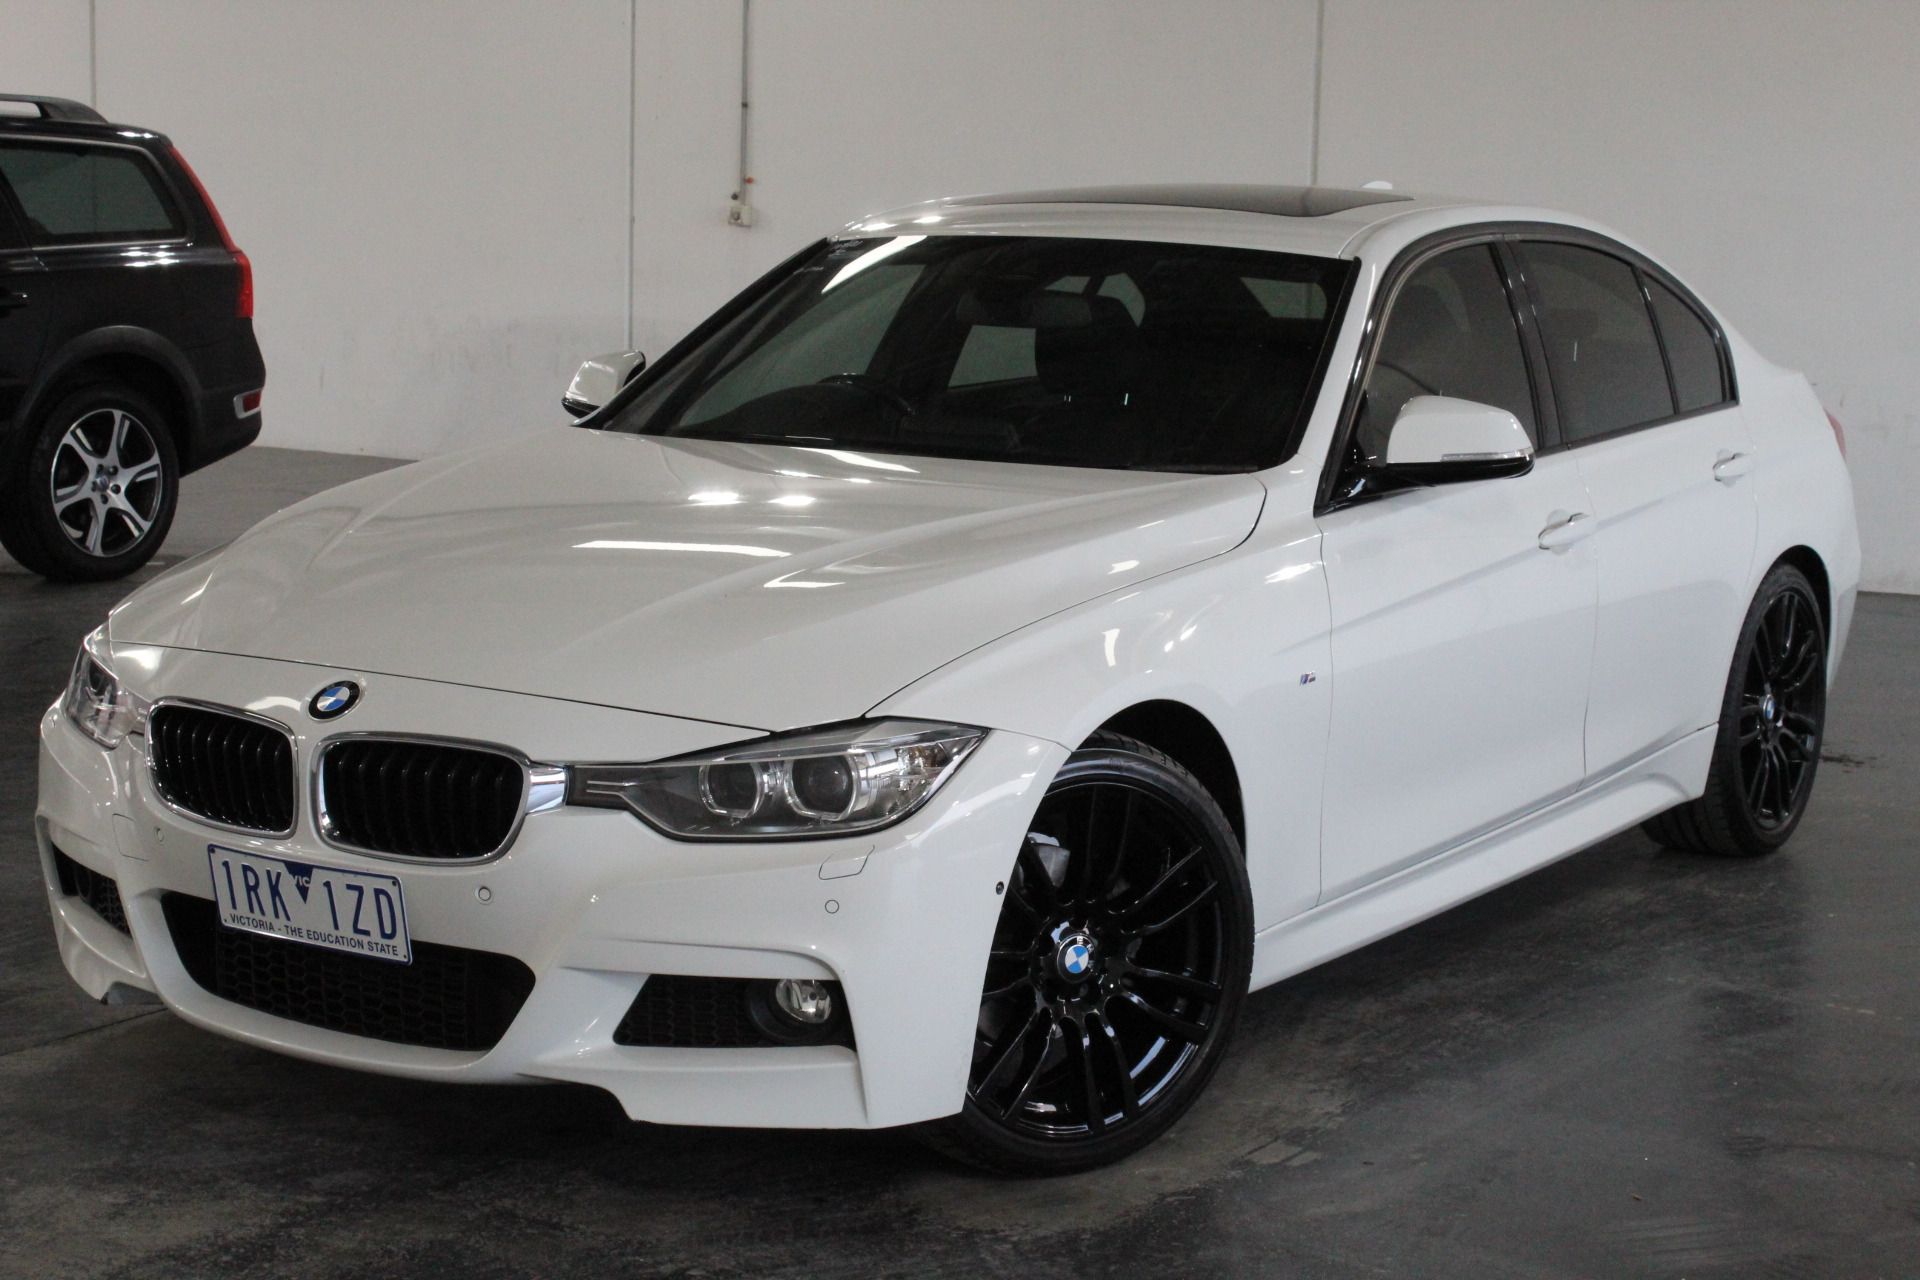 2015 BMW 3 Series 320i F30 Automatic - 8 Speed Sedan